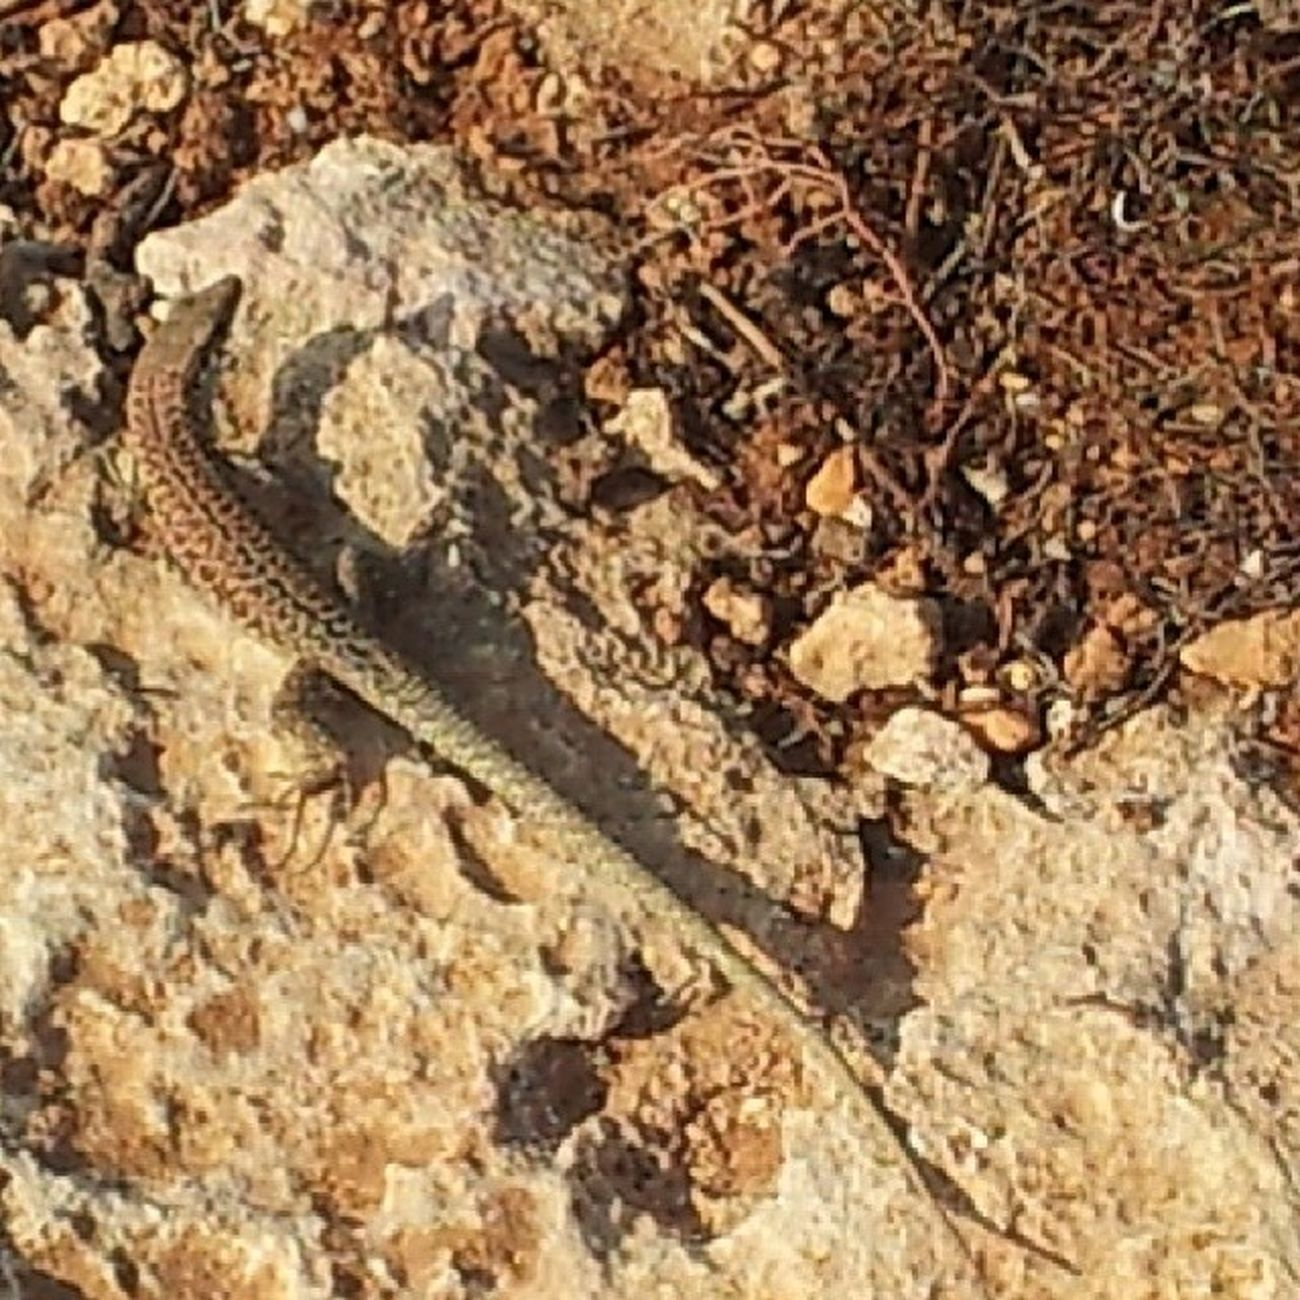 Nature Comino Visitcomino Lizard shadow